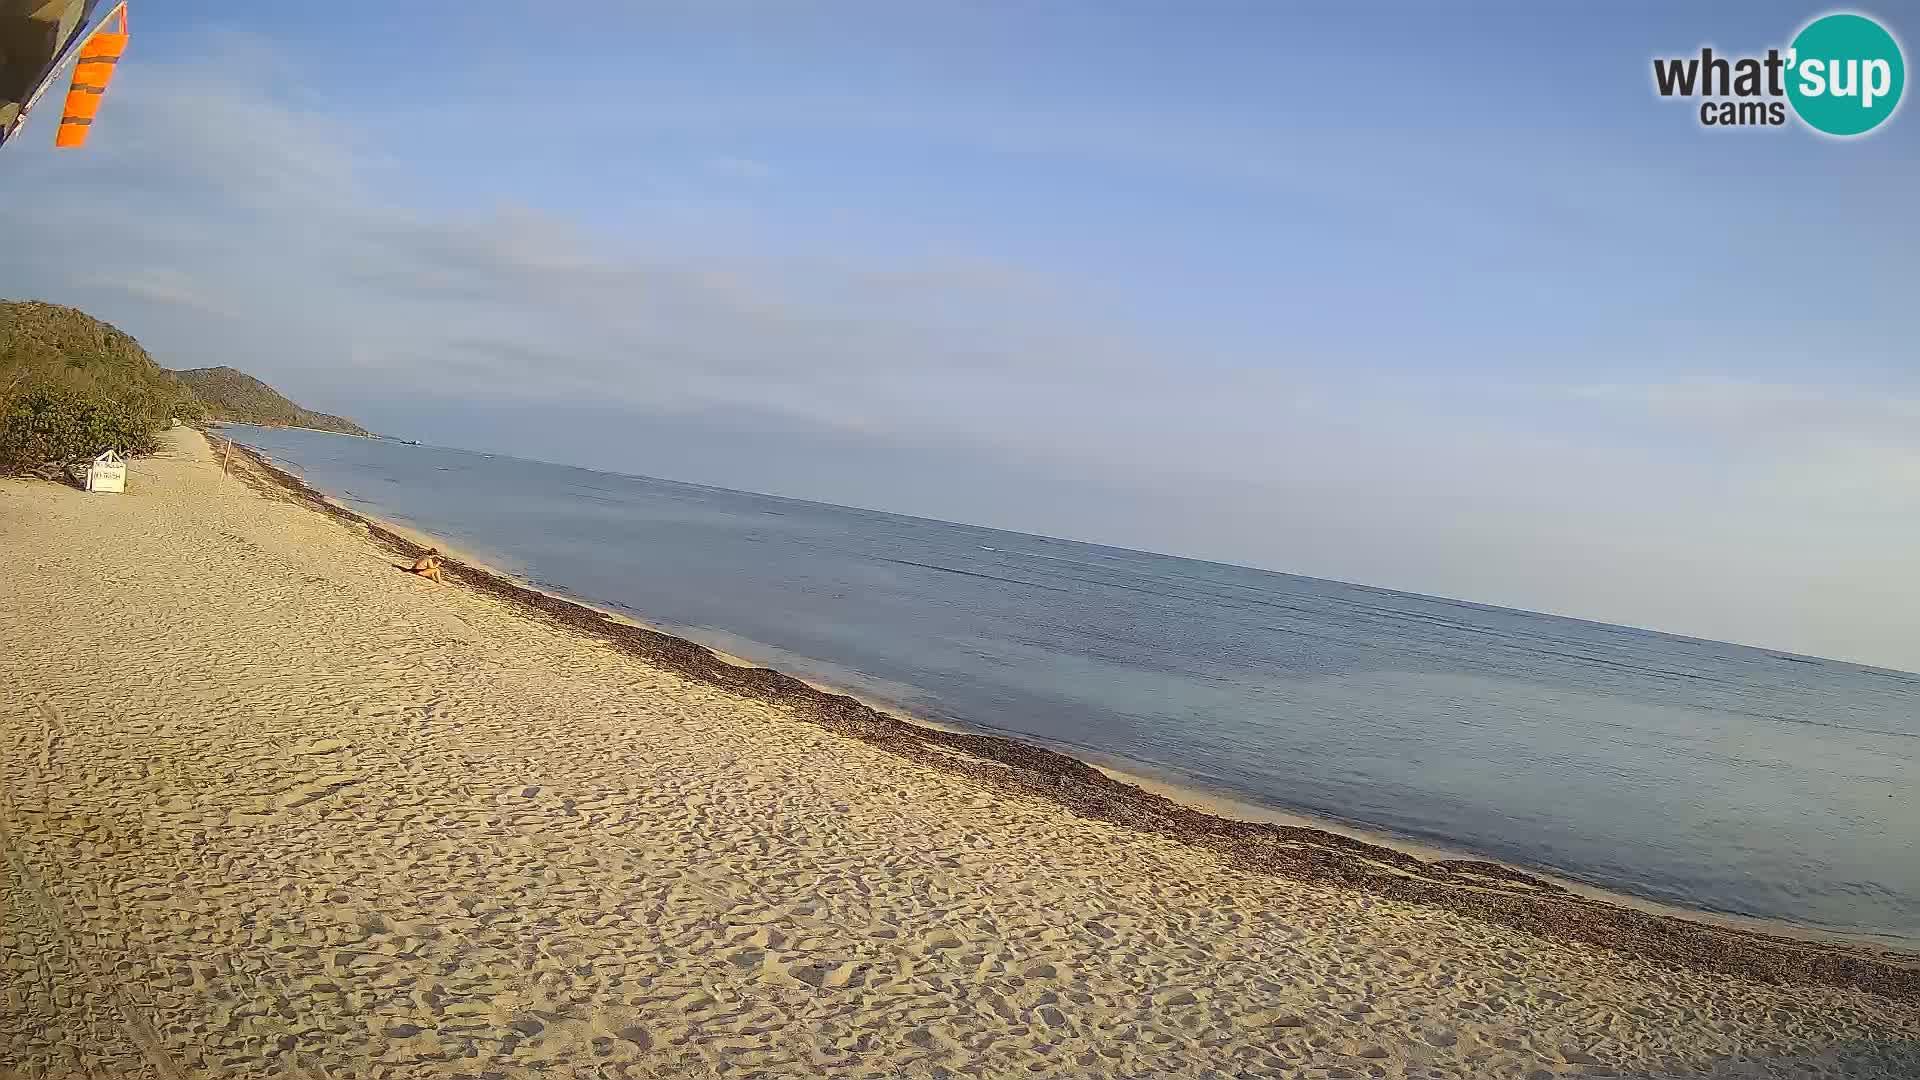 Webcam Buen Hombre beach – Kite School